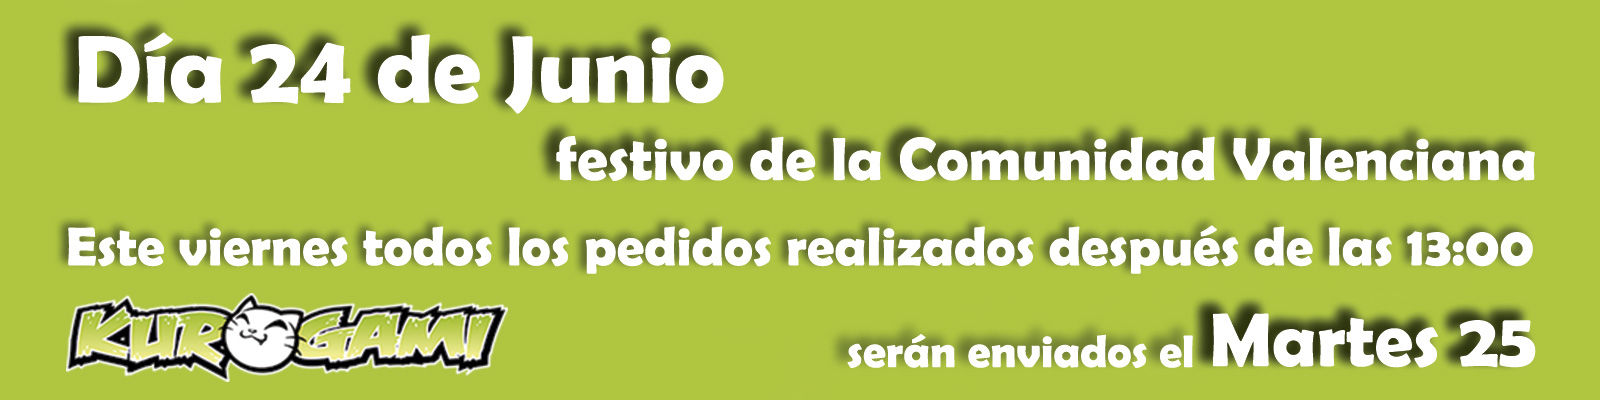 Festivo_Comunidad_Valenciana